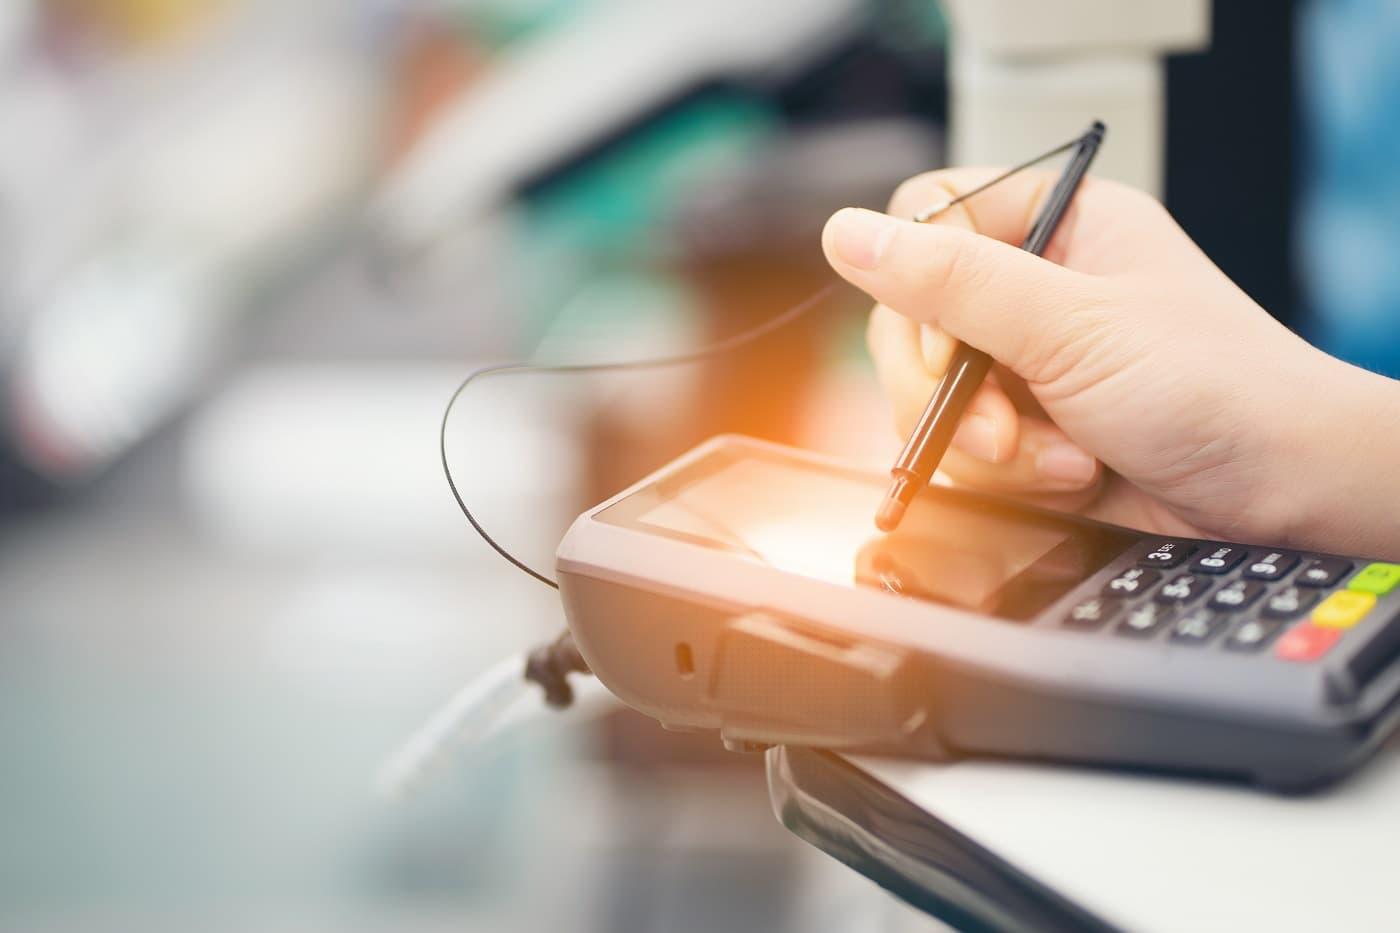 firma biométrica pago con tarjeta